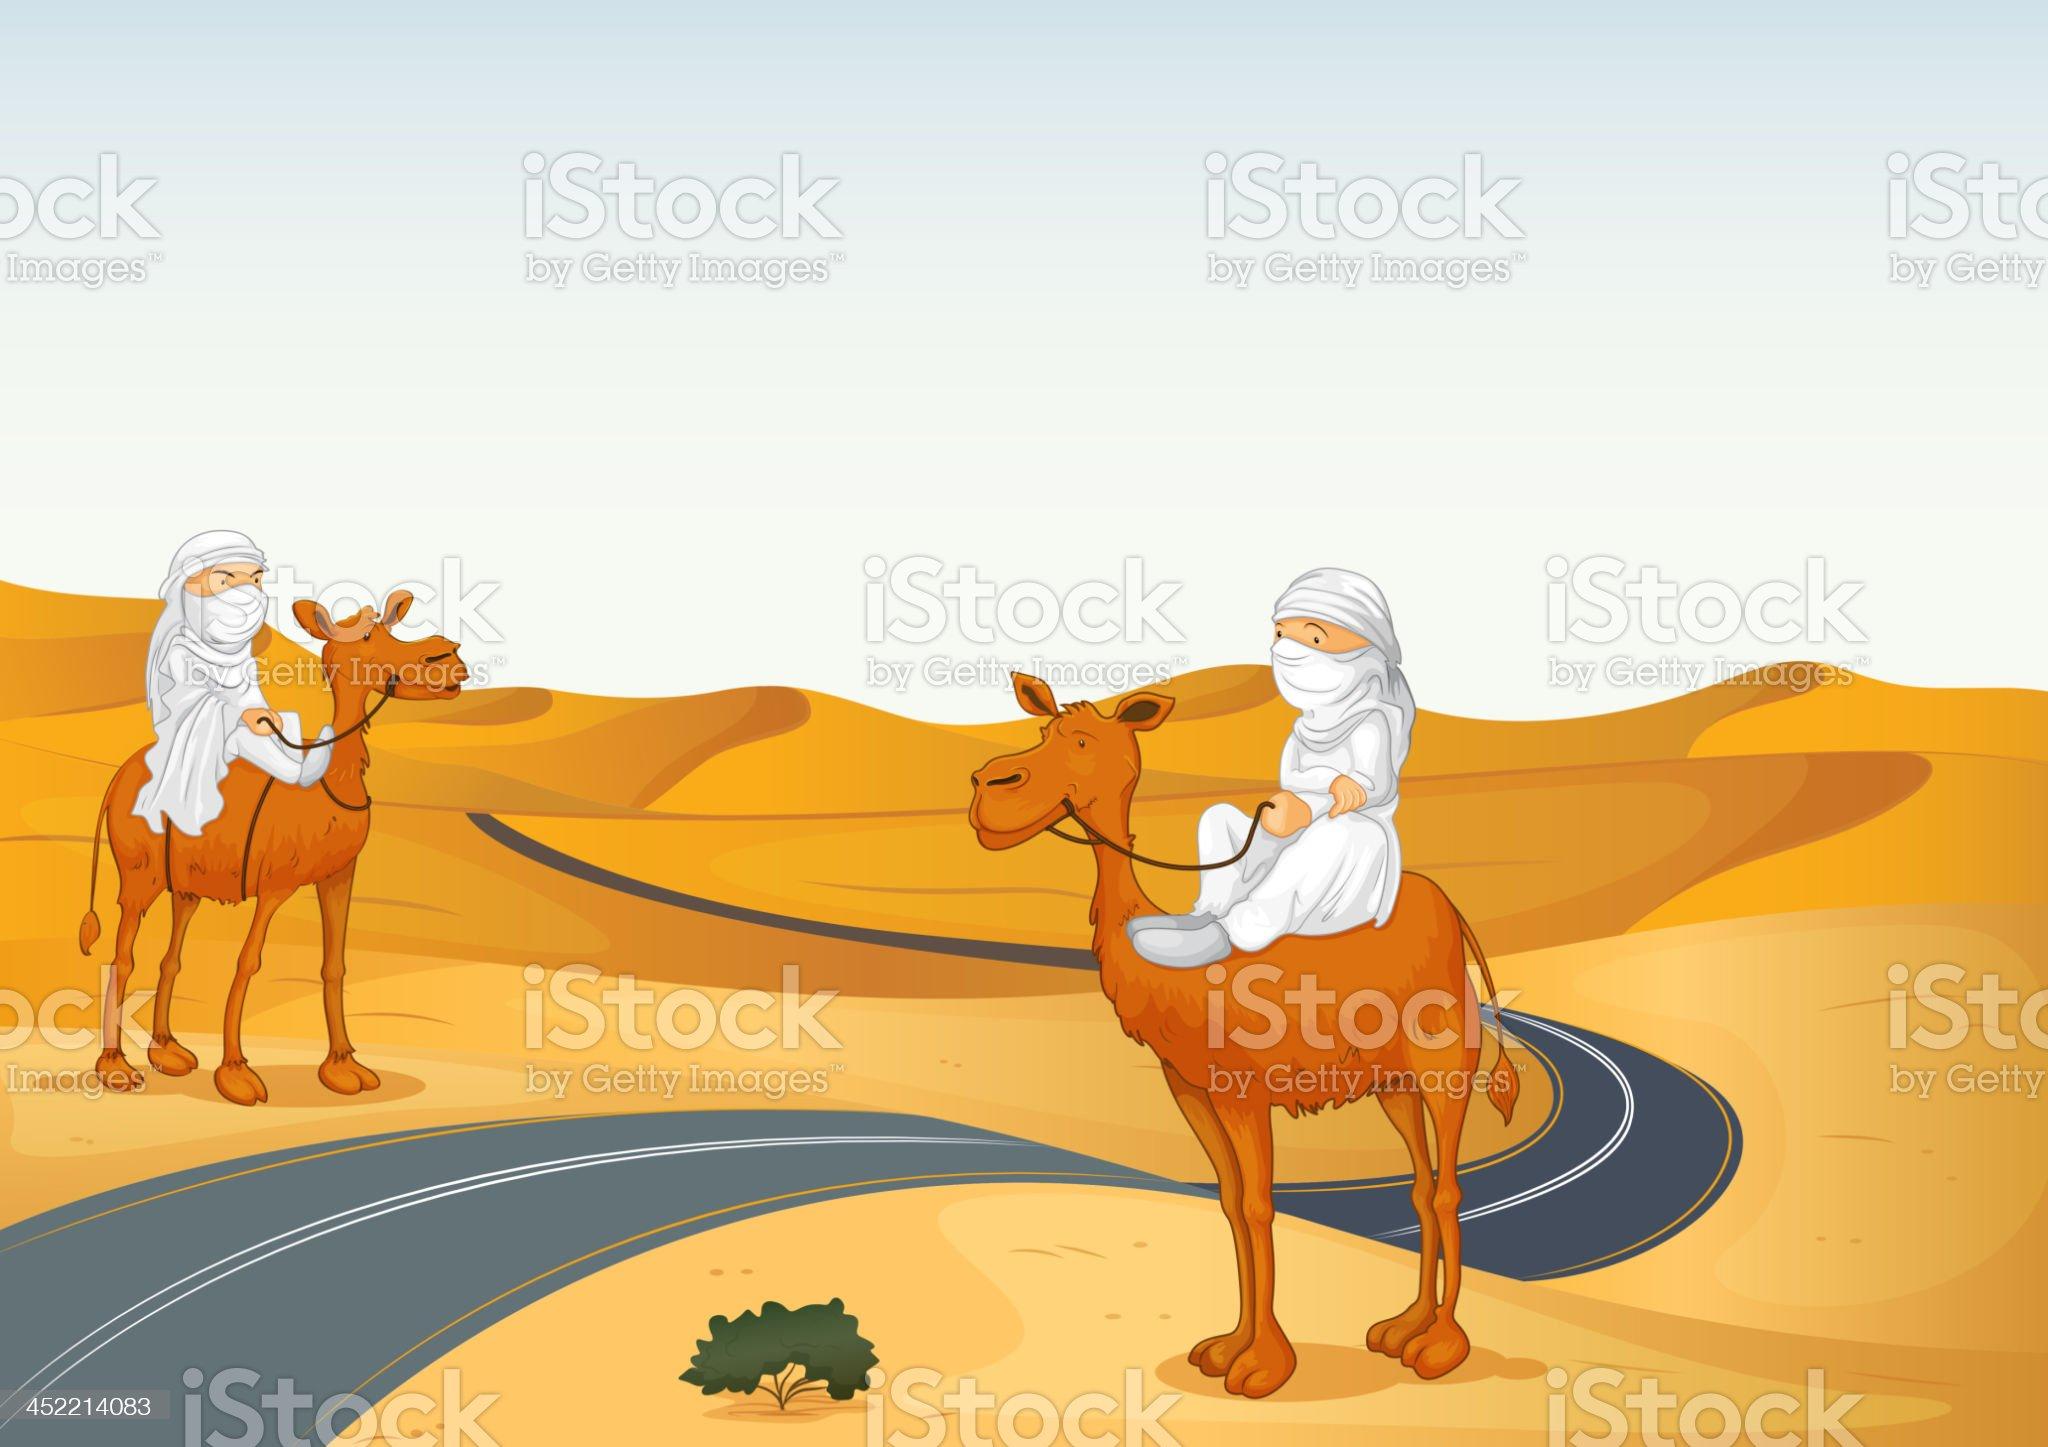 arabians riding on a camel royalty-free stock vector art